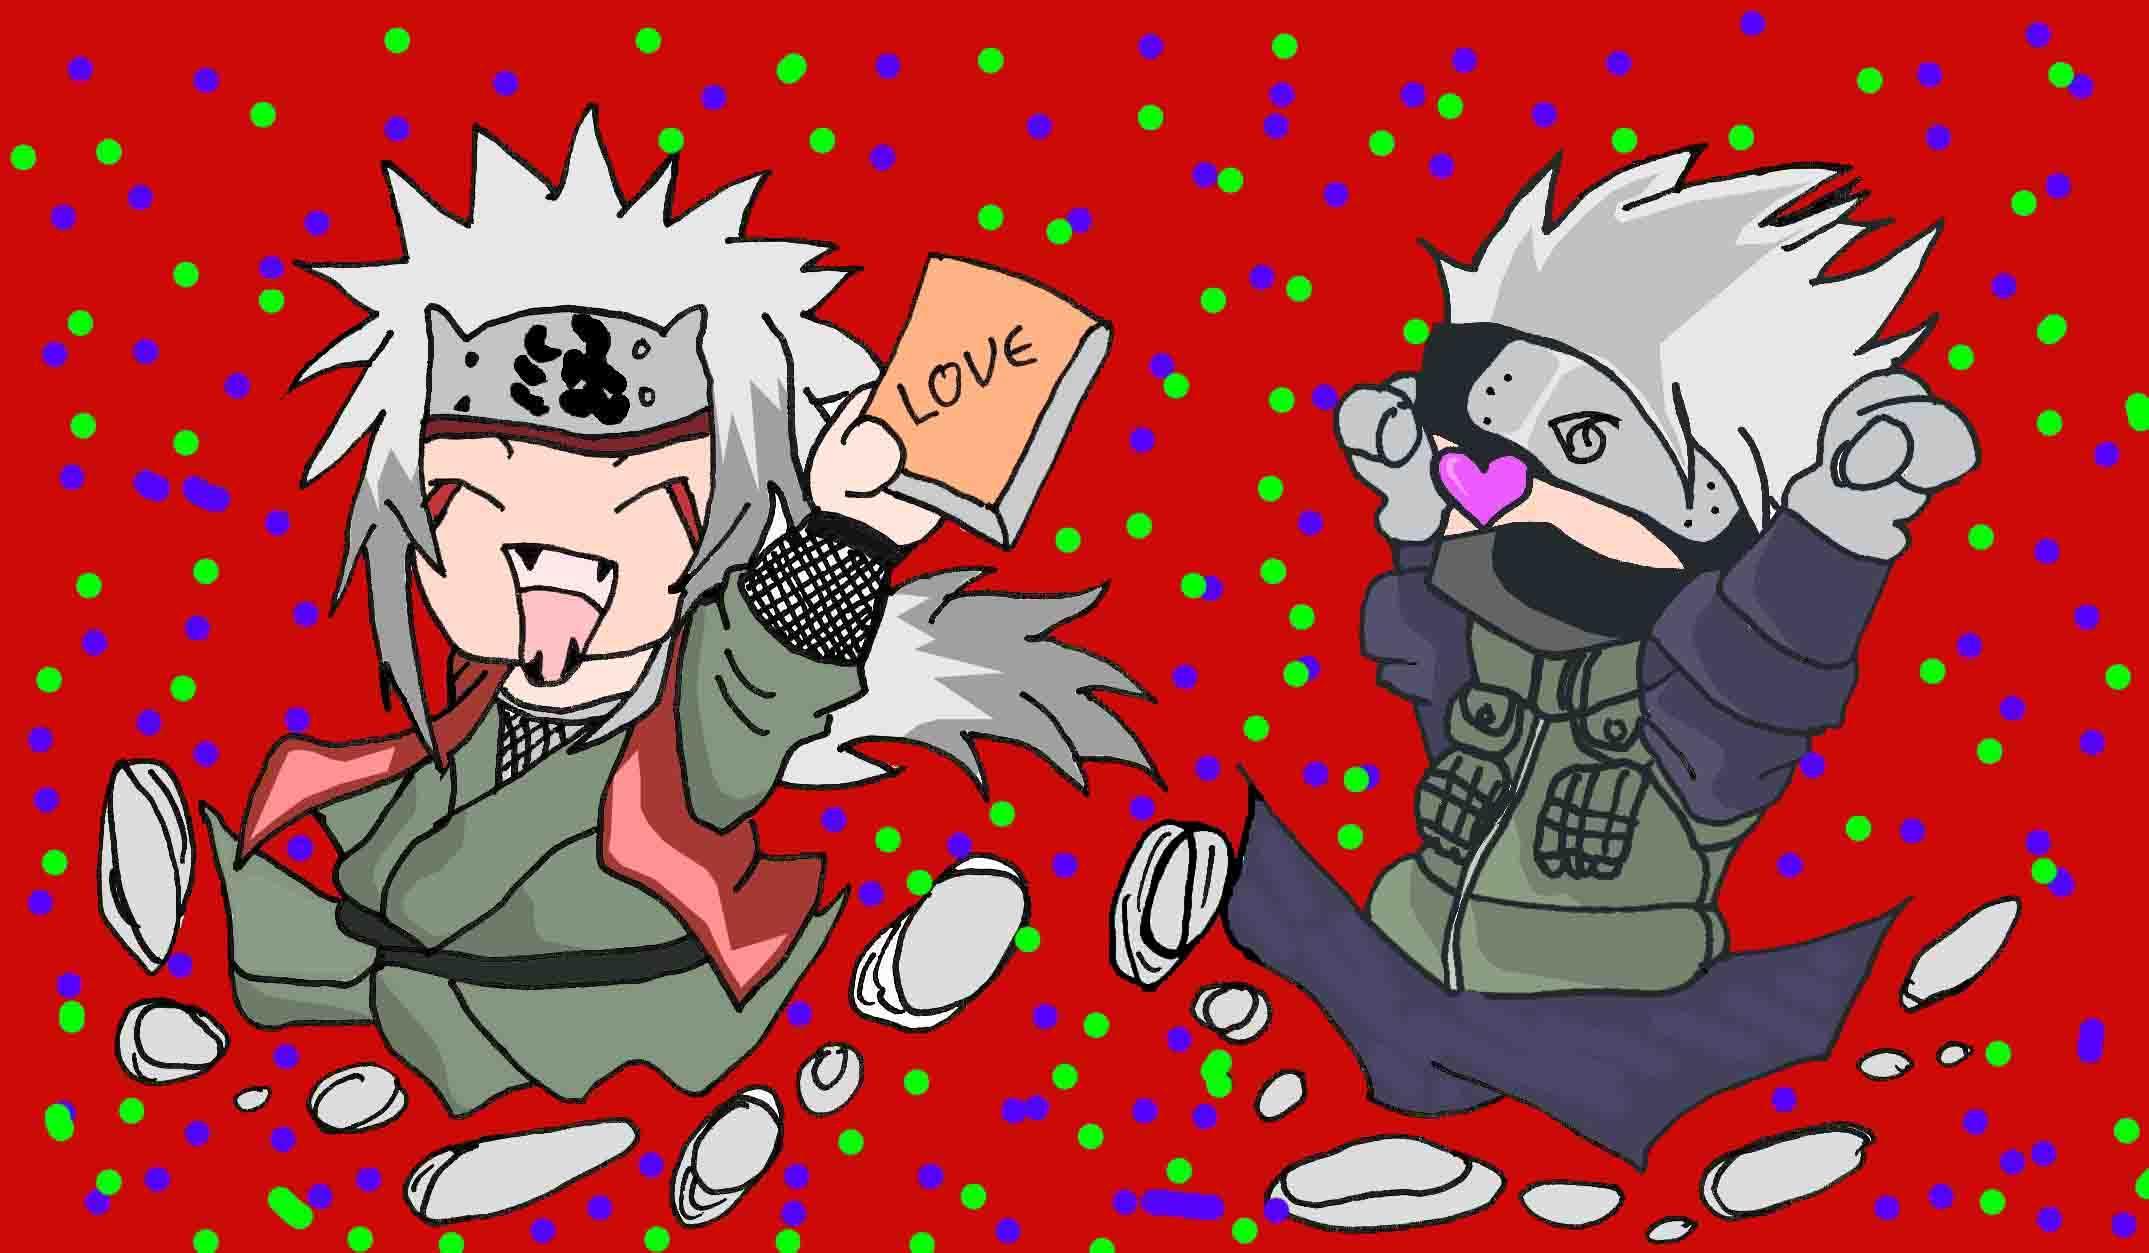 Naruto The Way Of Naruto Kidnaping De Livre Sacree De